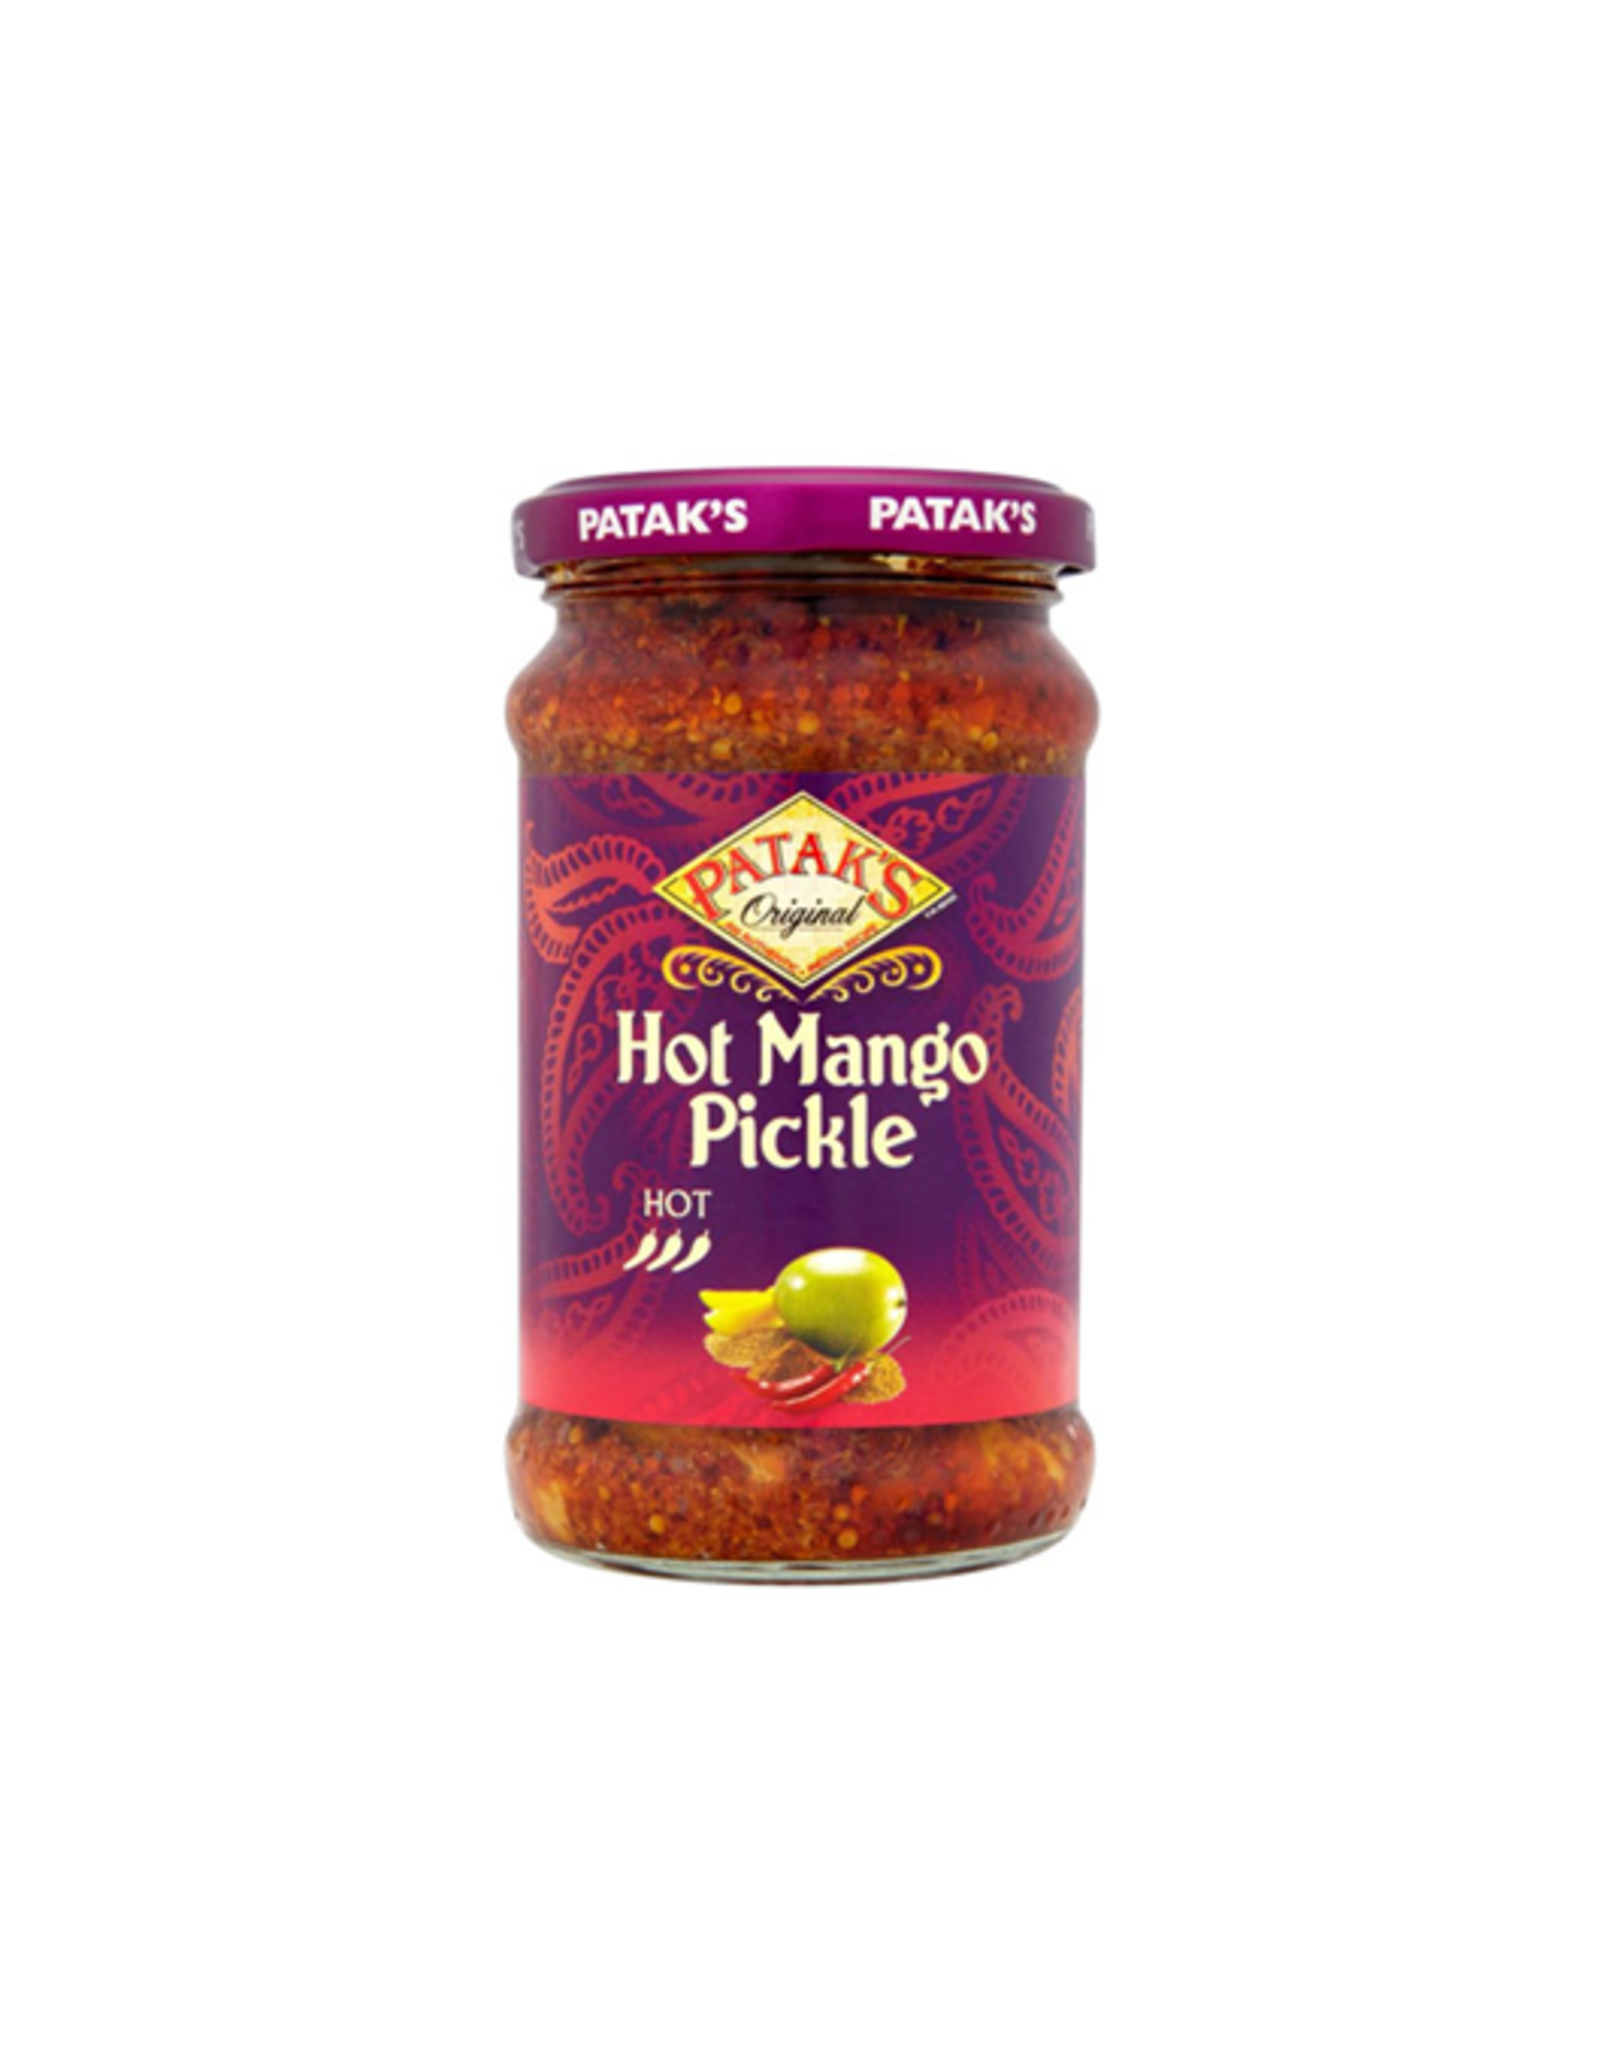 Patak's Hot Mango Pickle